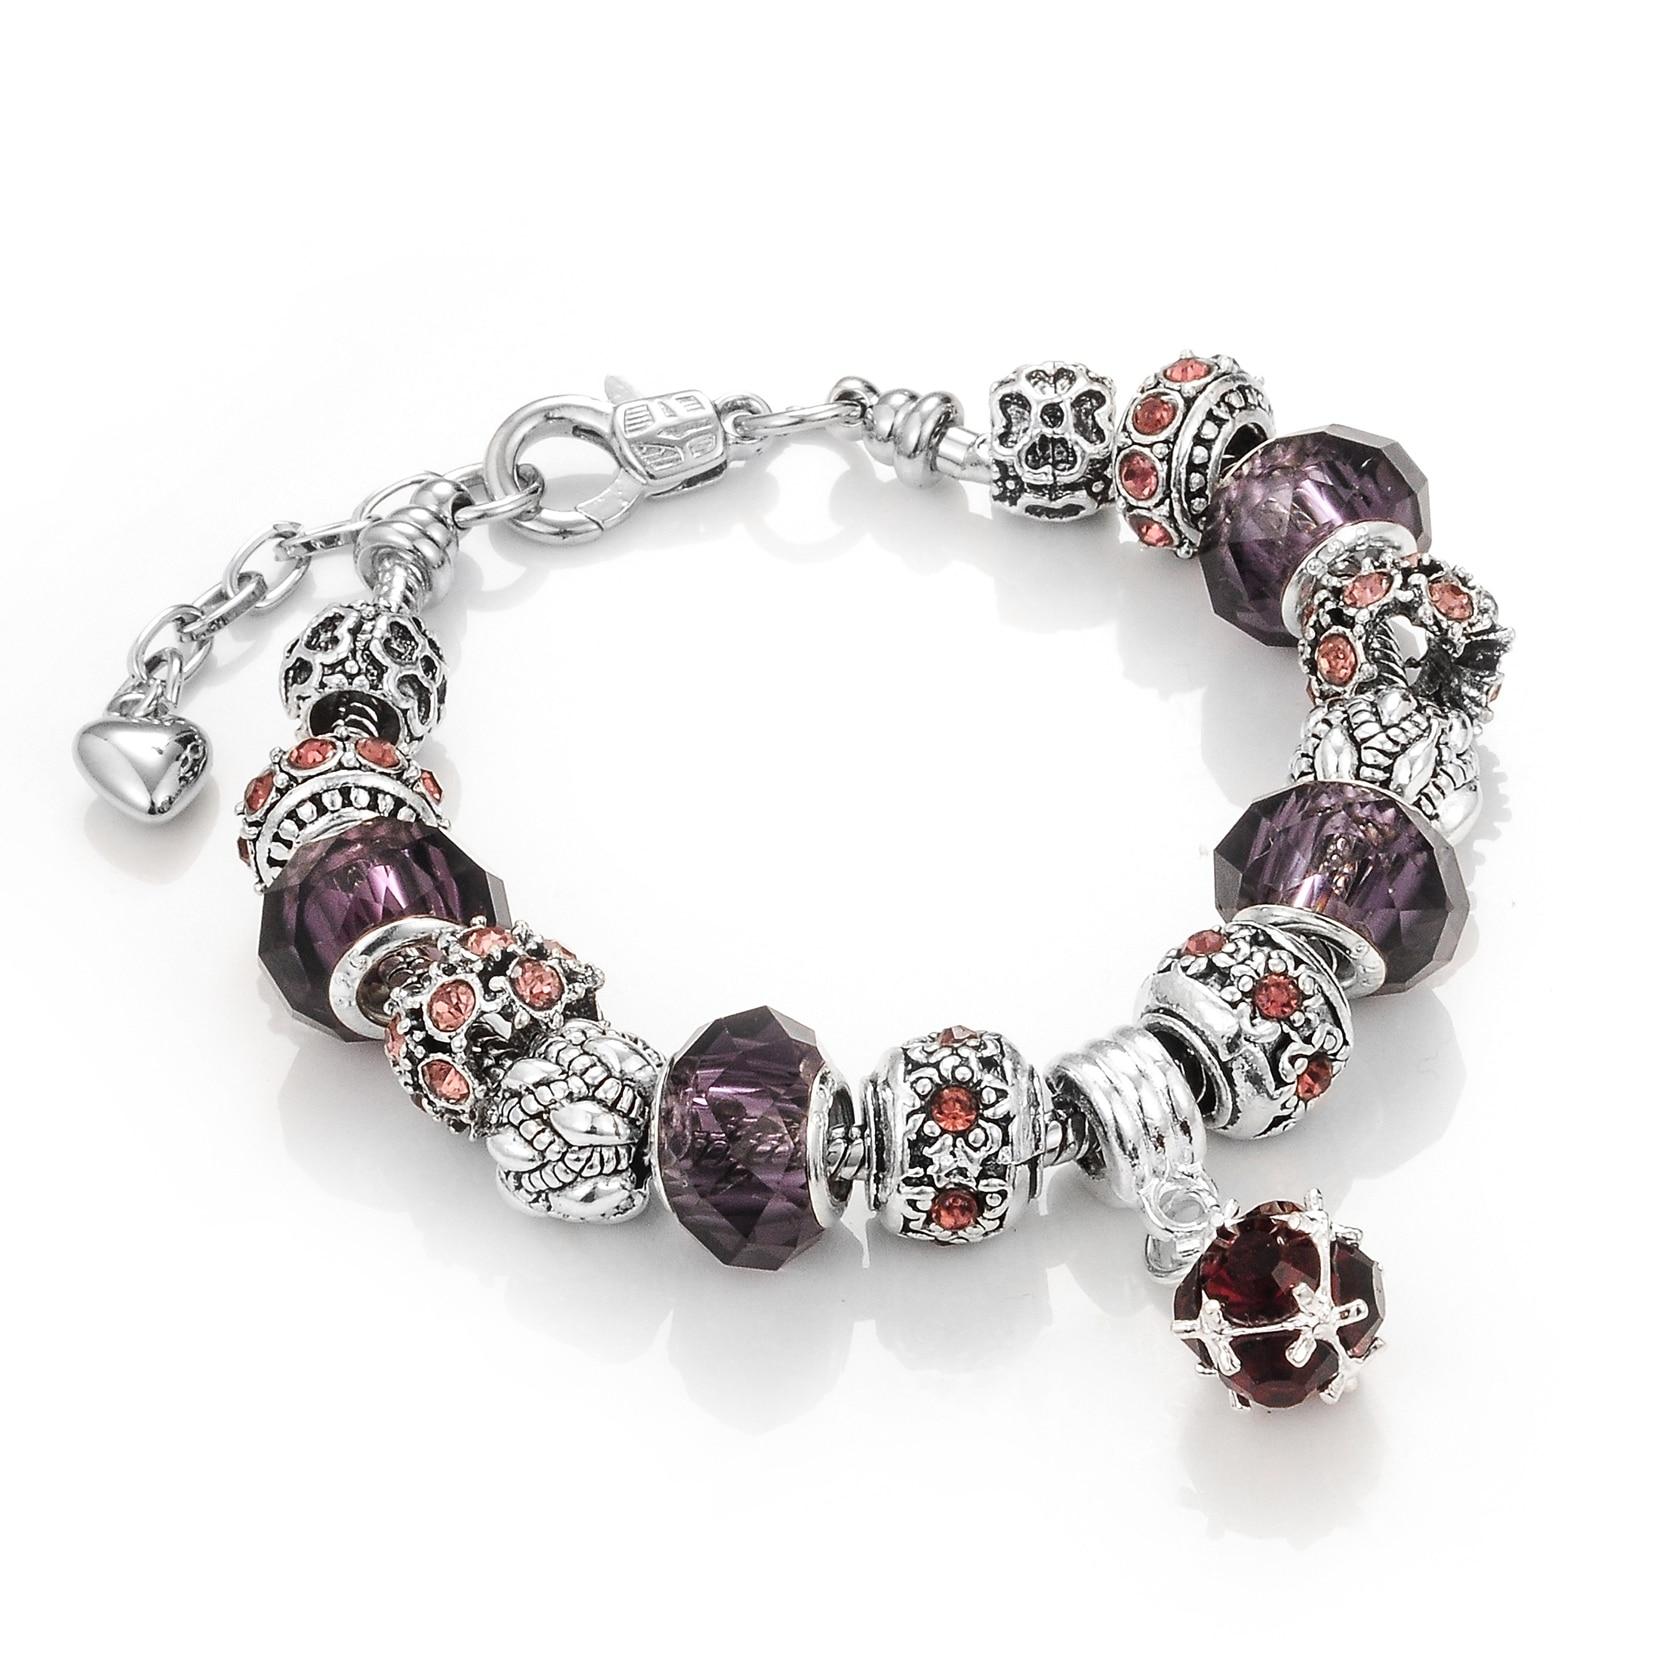 2017 Fashion Glass Diy Charm Bracelet Flower Crystal Snake Chain Bracelet  For Women Sterling Silver Jewelry